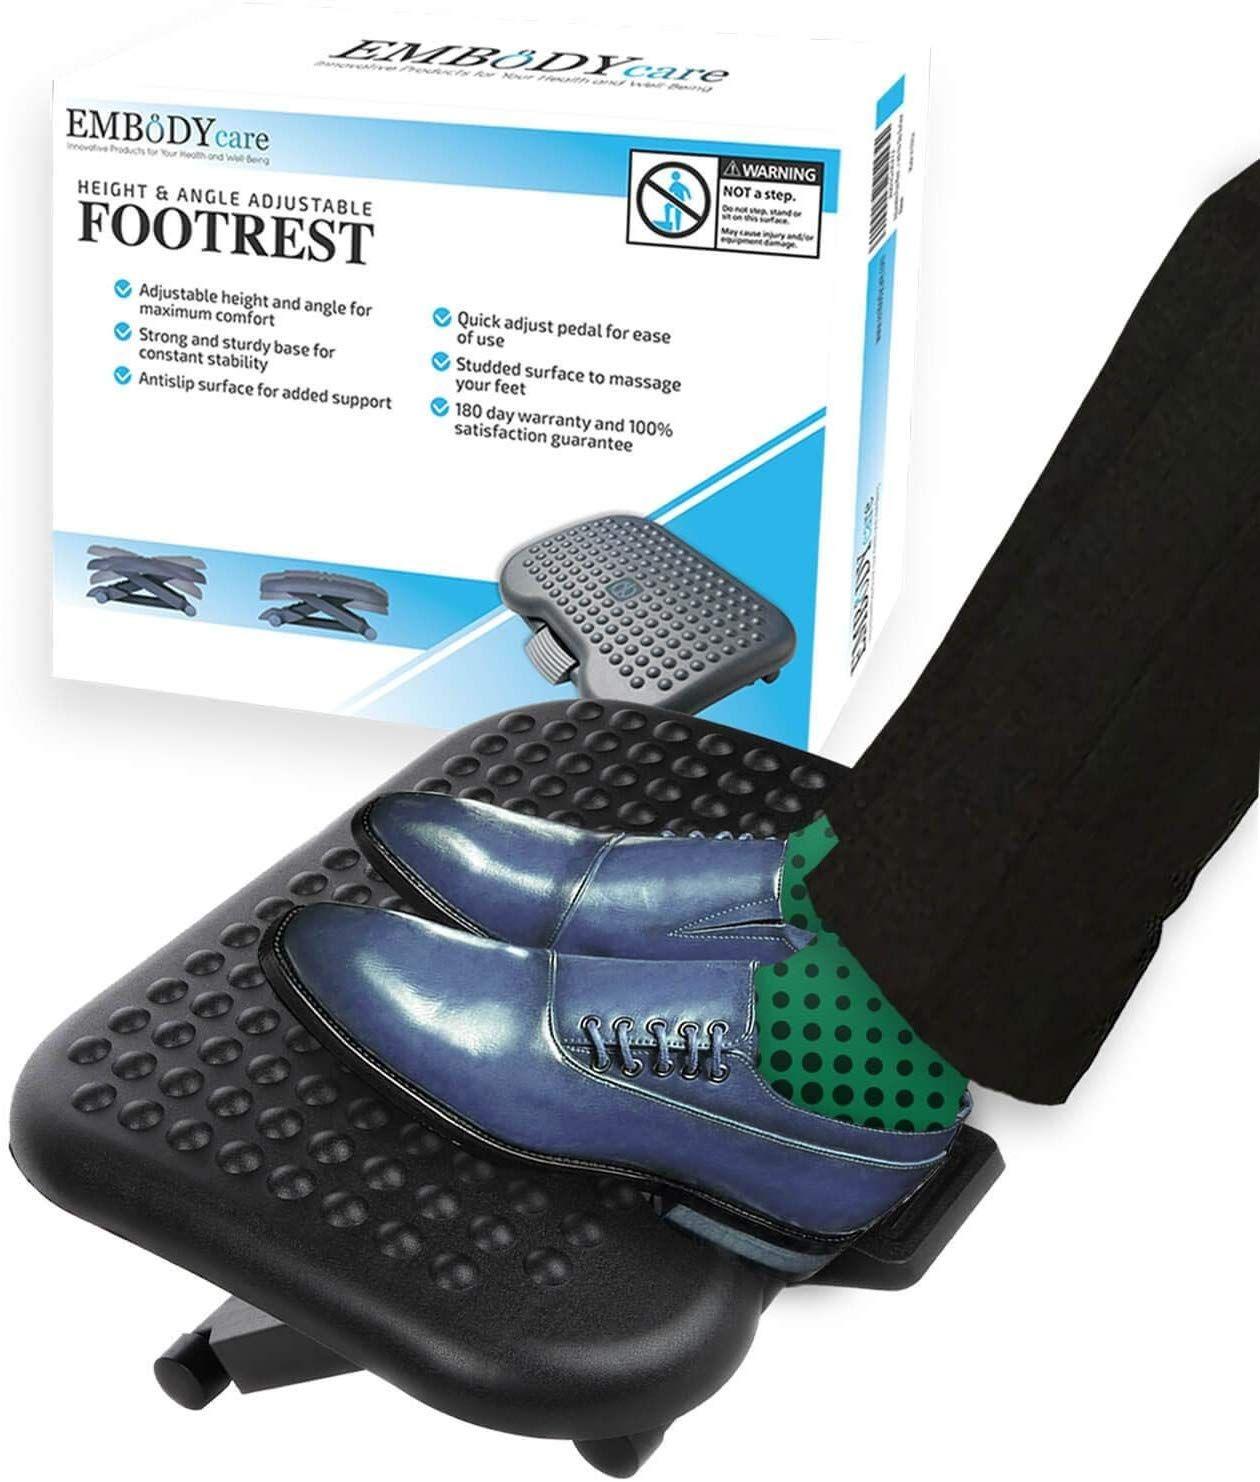 Desk Foot Rest 10 Best Foot Rest Under Desk Foot Stools In 2020 Foot Massage Foot Rest Achy Feet